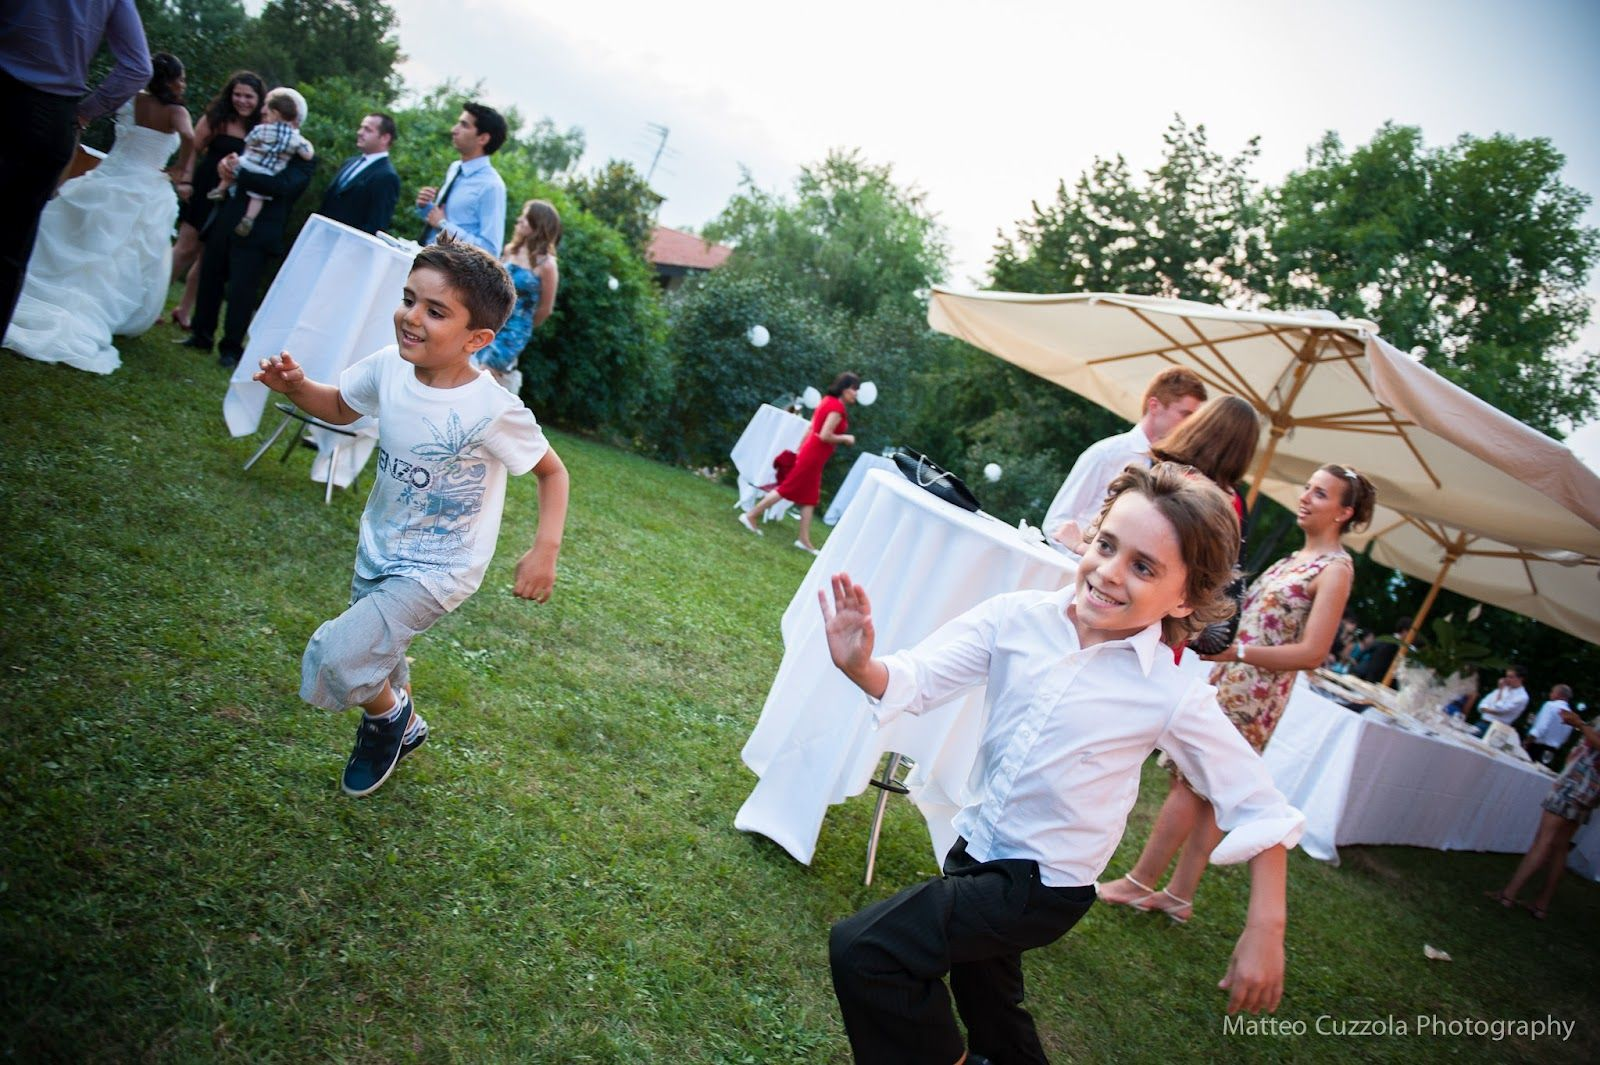 Matteo Cuzzola Photography Matrimonio a San Daniele del